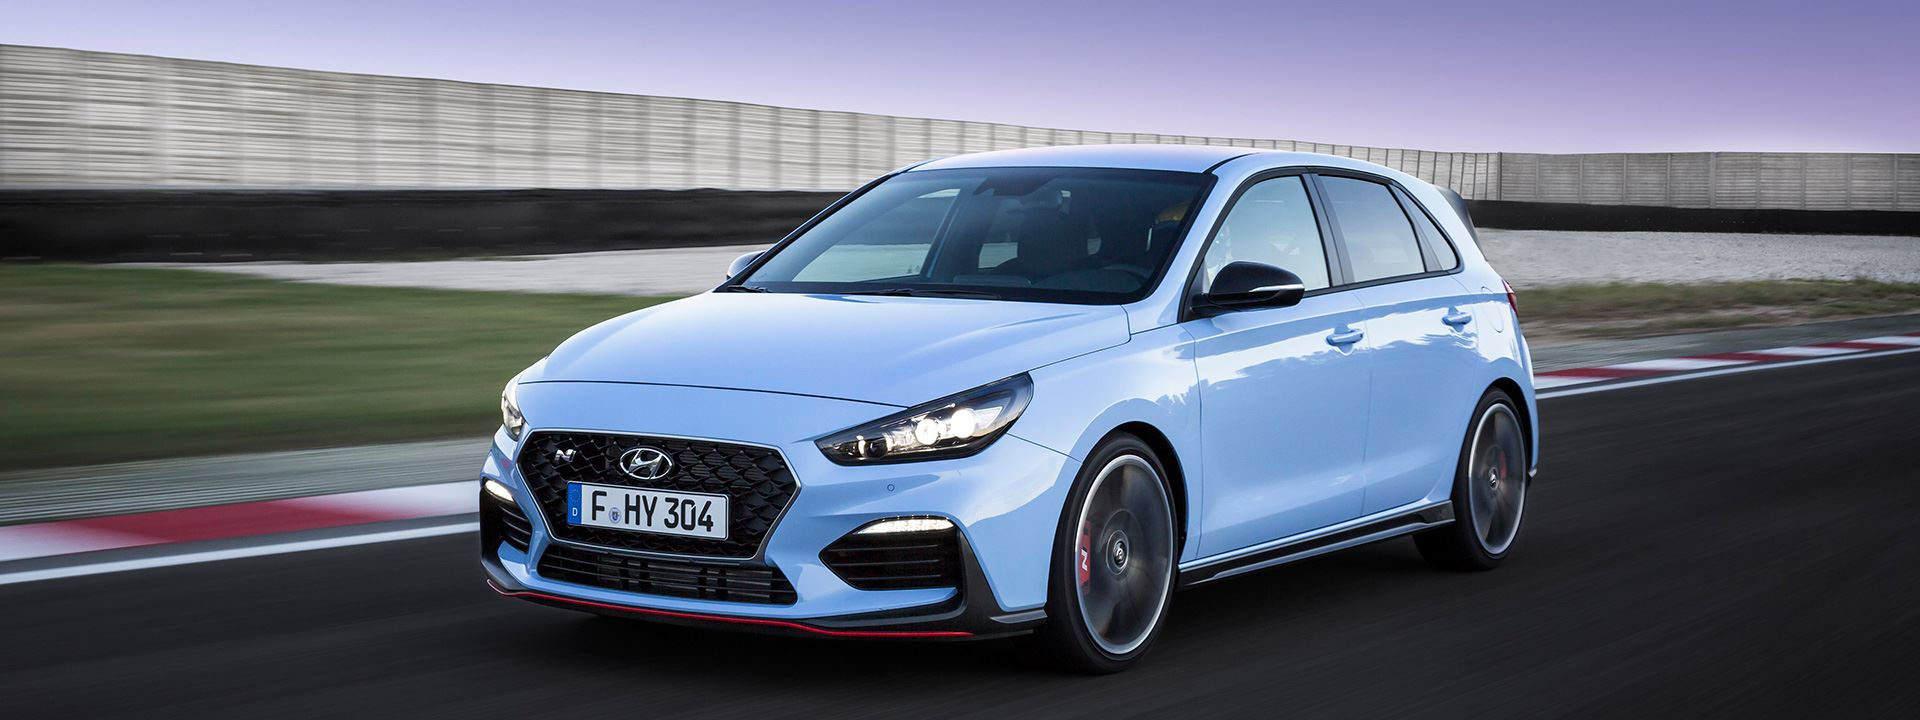 Dit is de high performance Hyundai i30 N